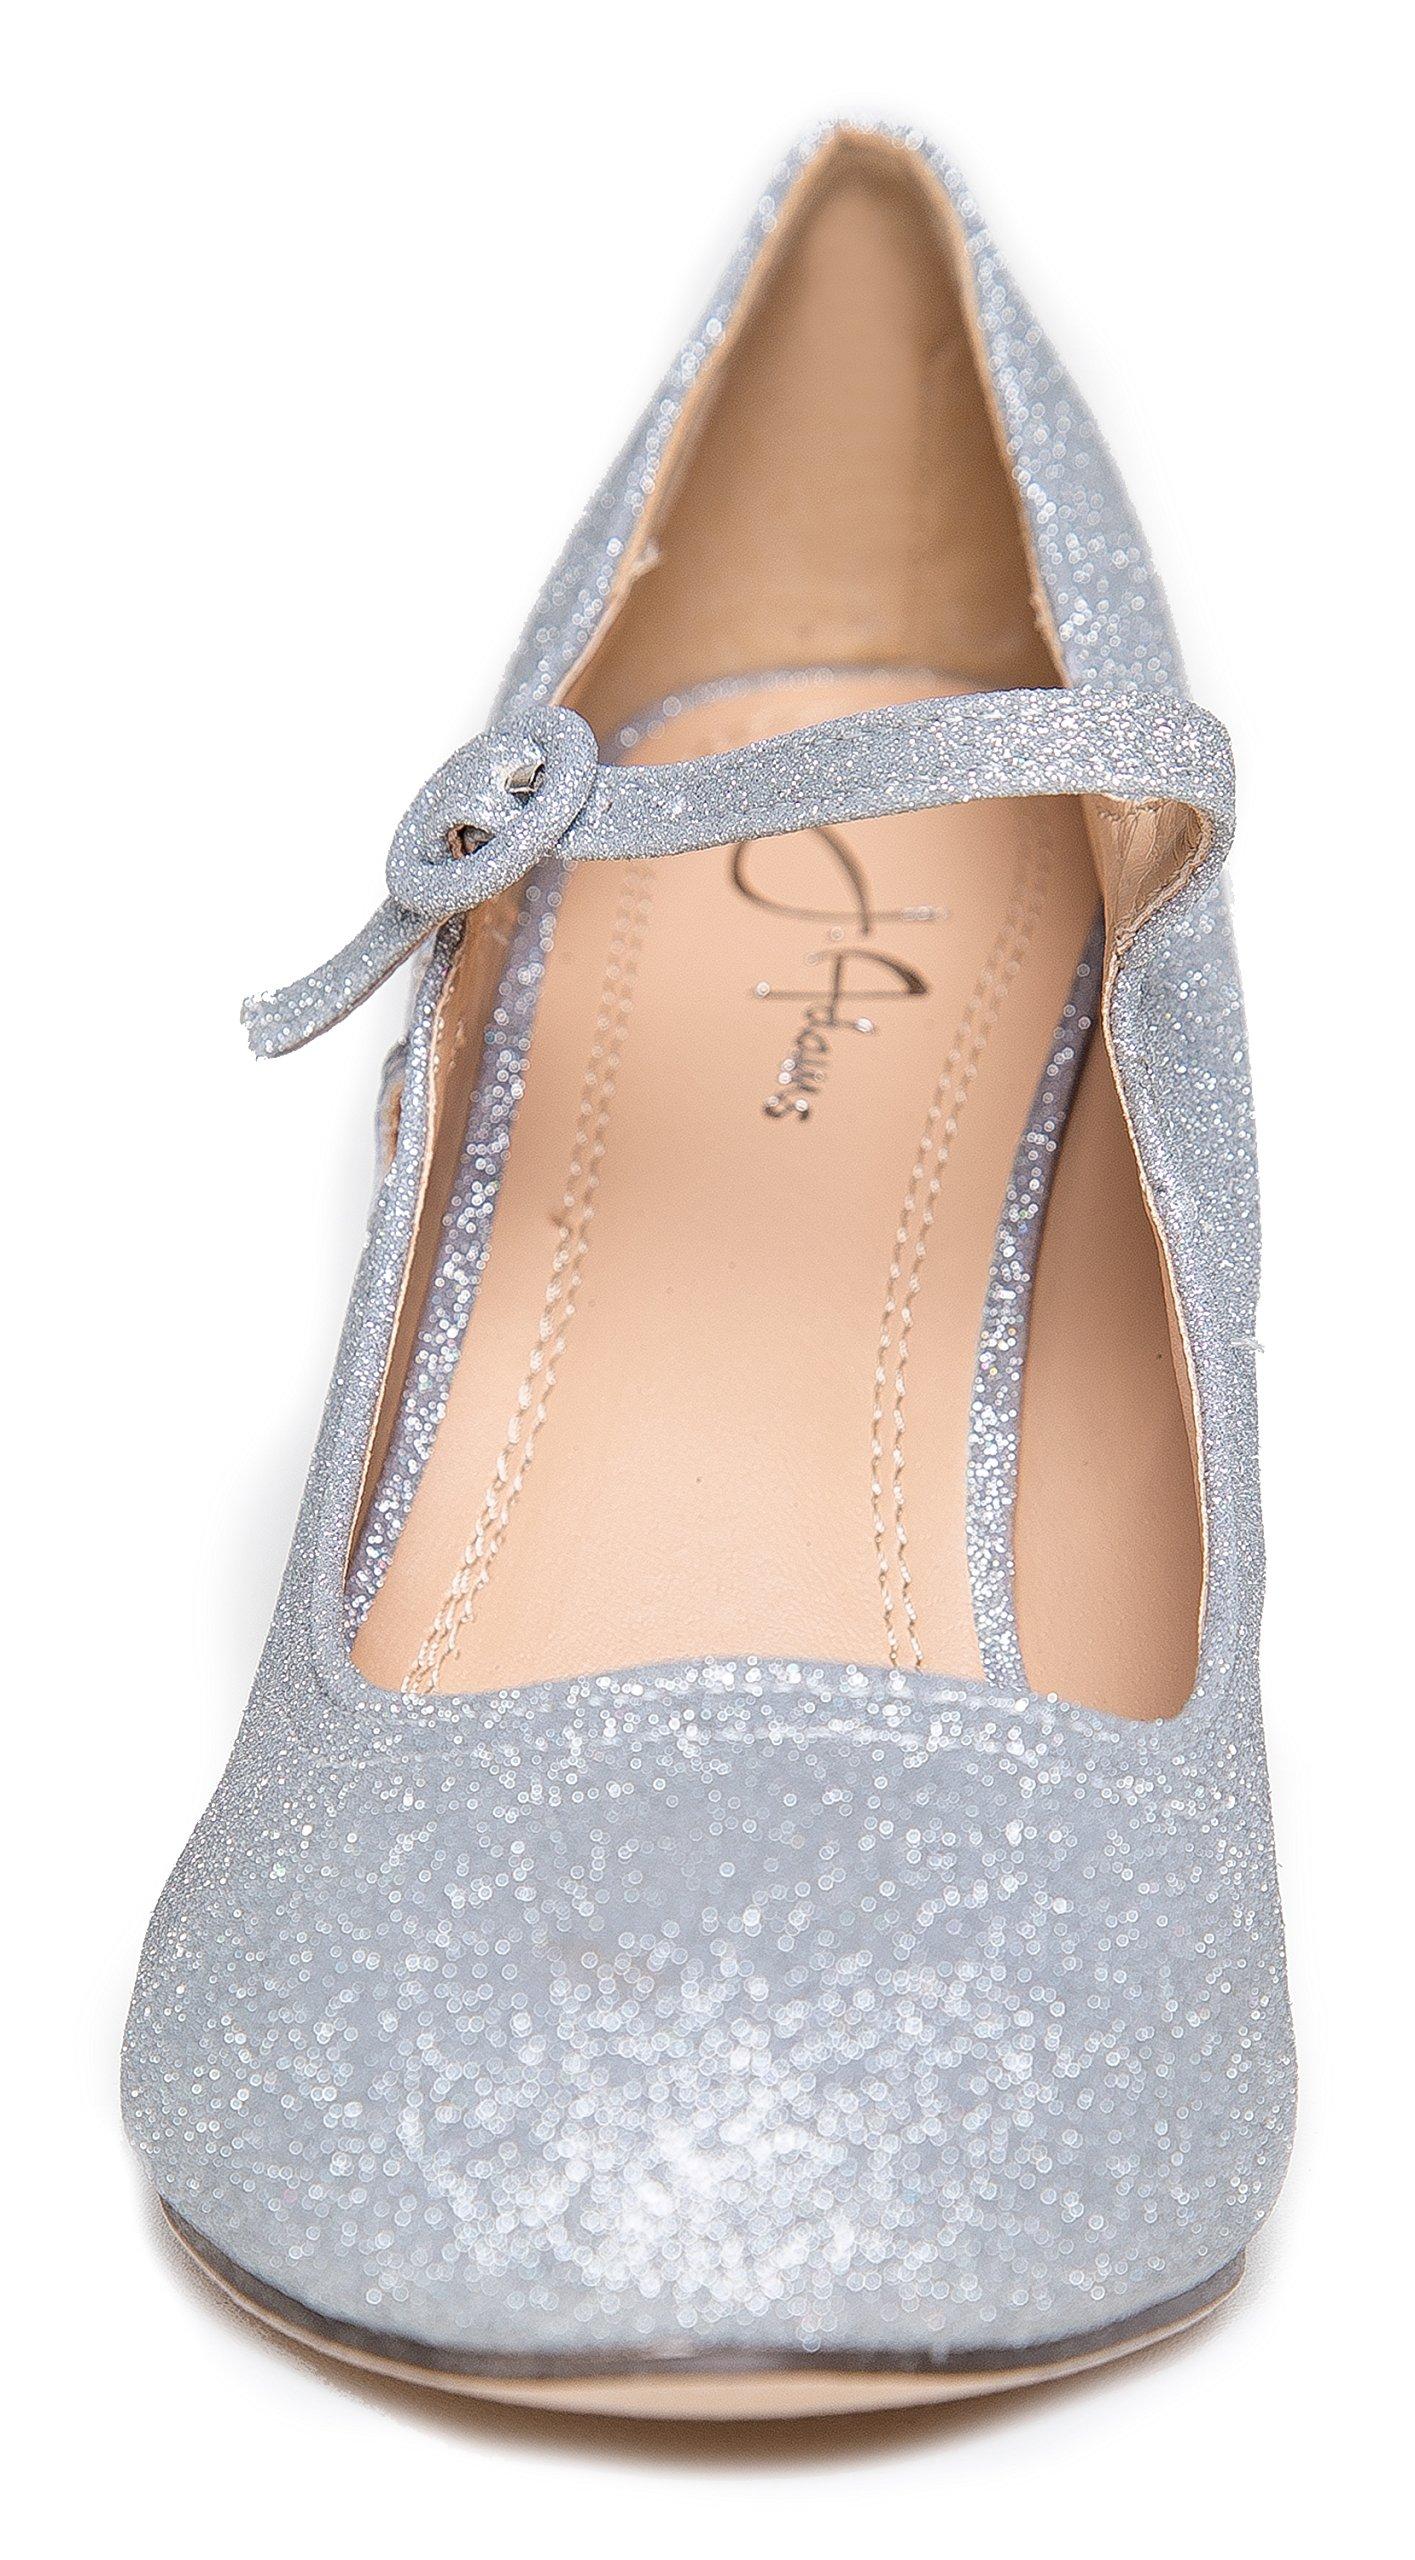 Pixie Mary Jane Heel, Silver Glitter, 8 B(M) US by ZooShoo (Image #4)